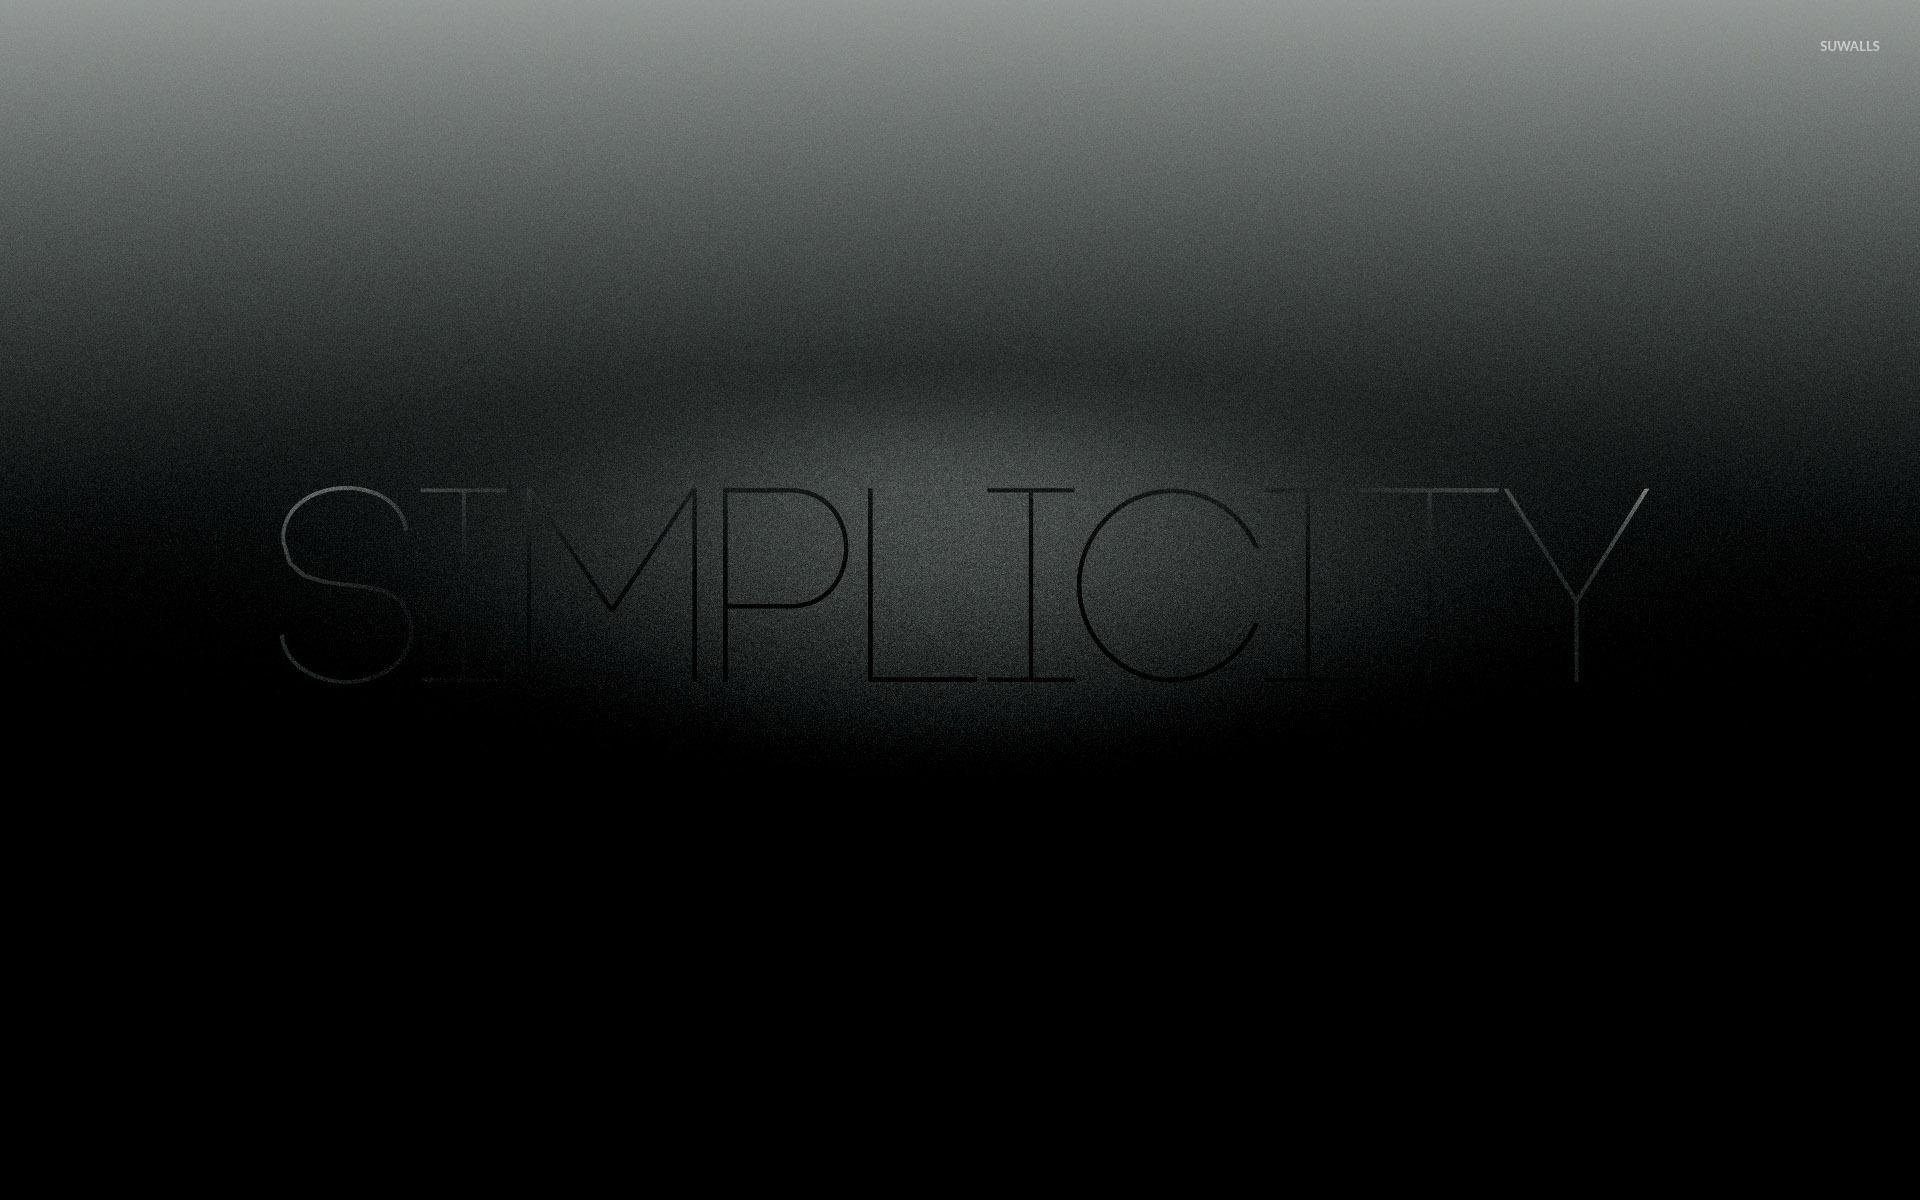 Simplicity wallpaper - Typography wallpapers - #32006  Simplicity Wallpaper